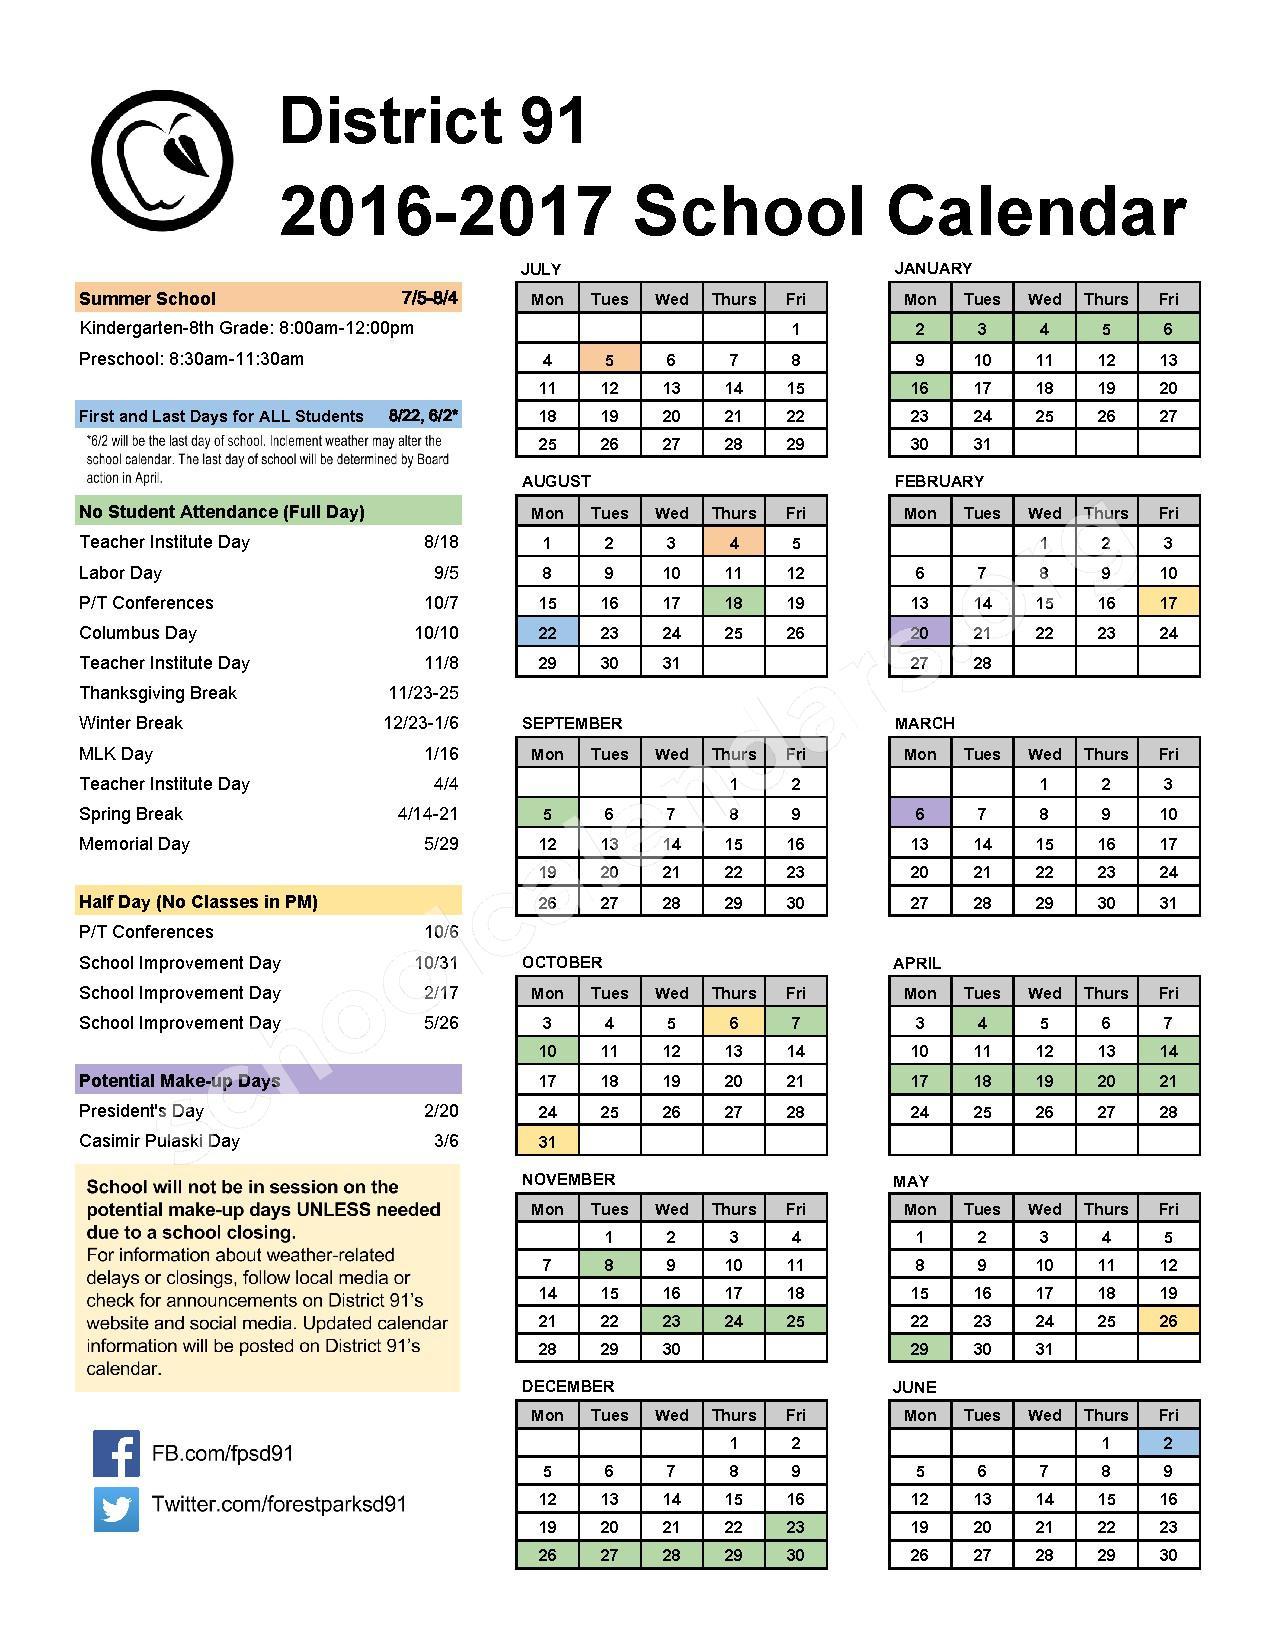 2016 - 2017 School Calendar – Betsy Ross Elementary School – page 1